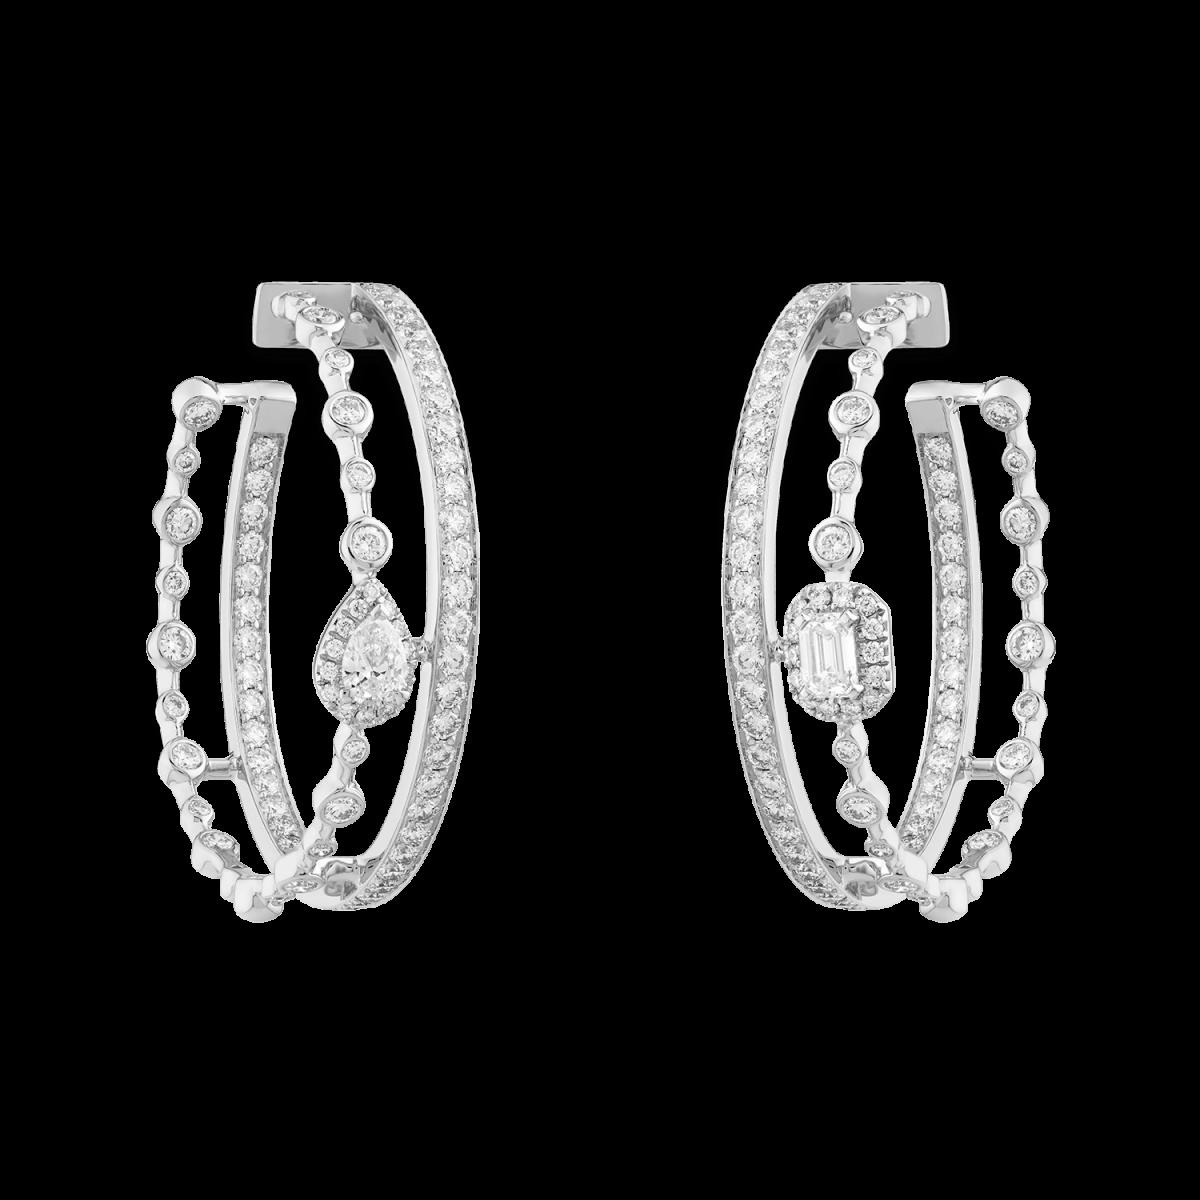 HAPPY Hoop Earrings with Diamonds